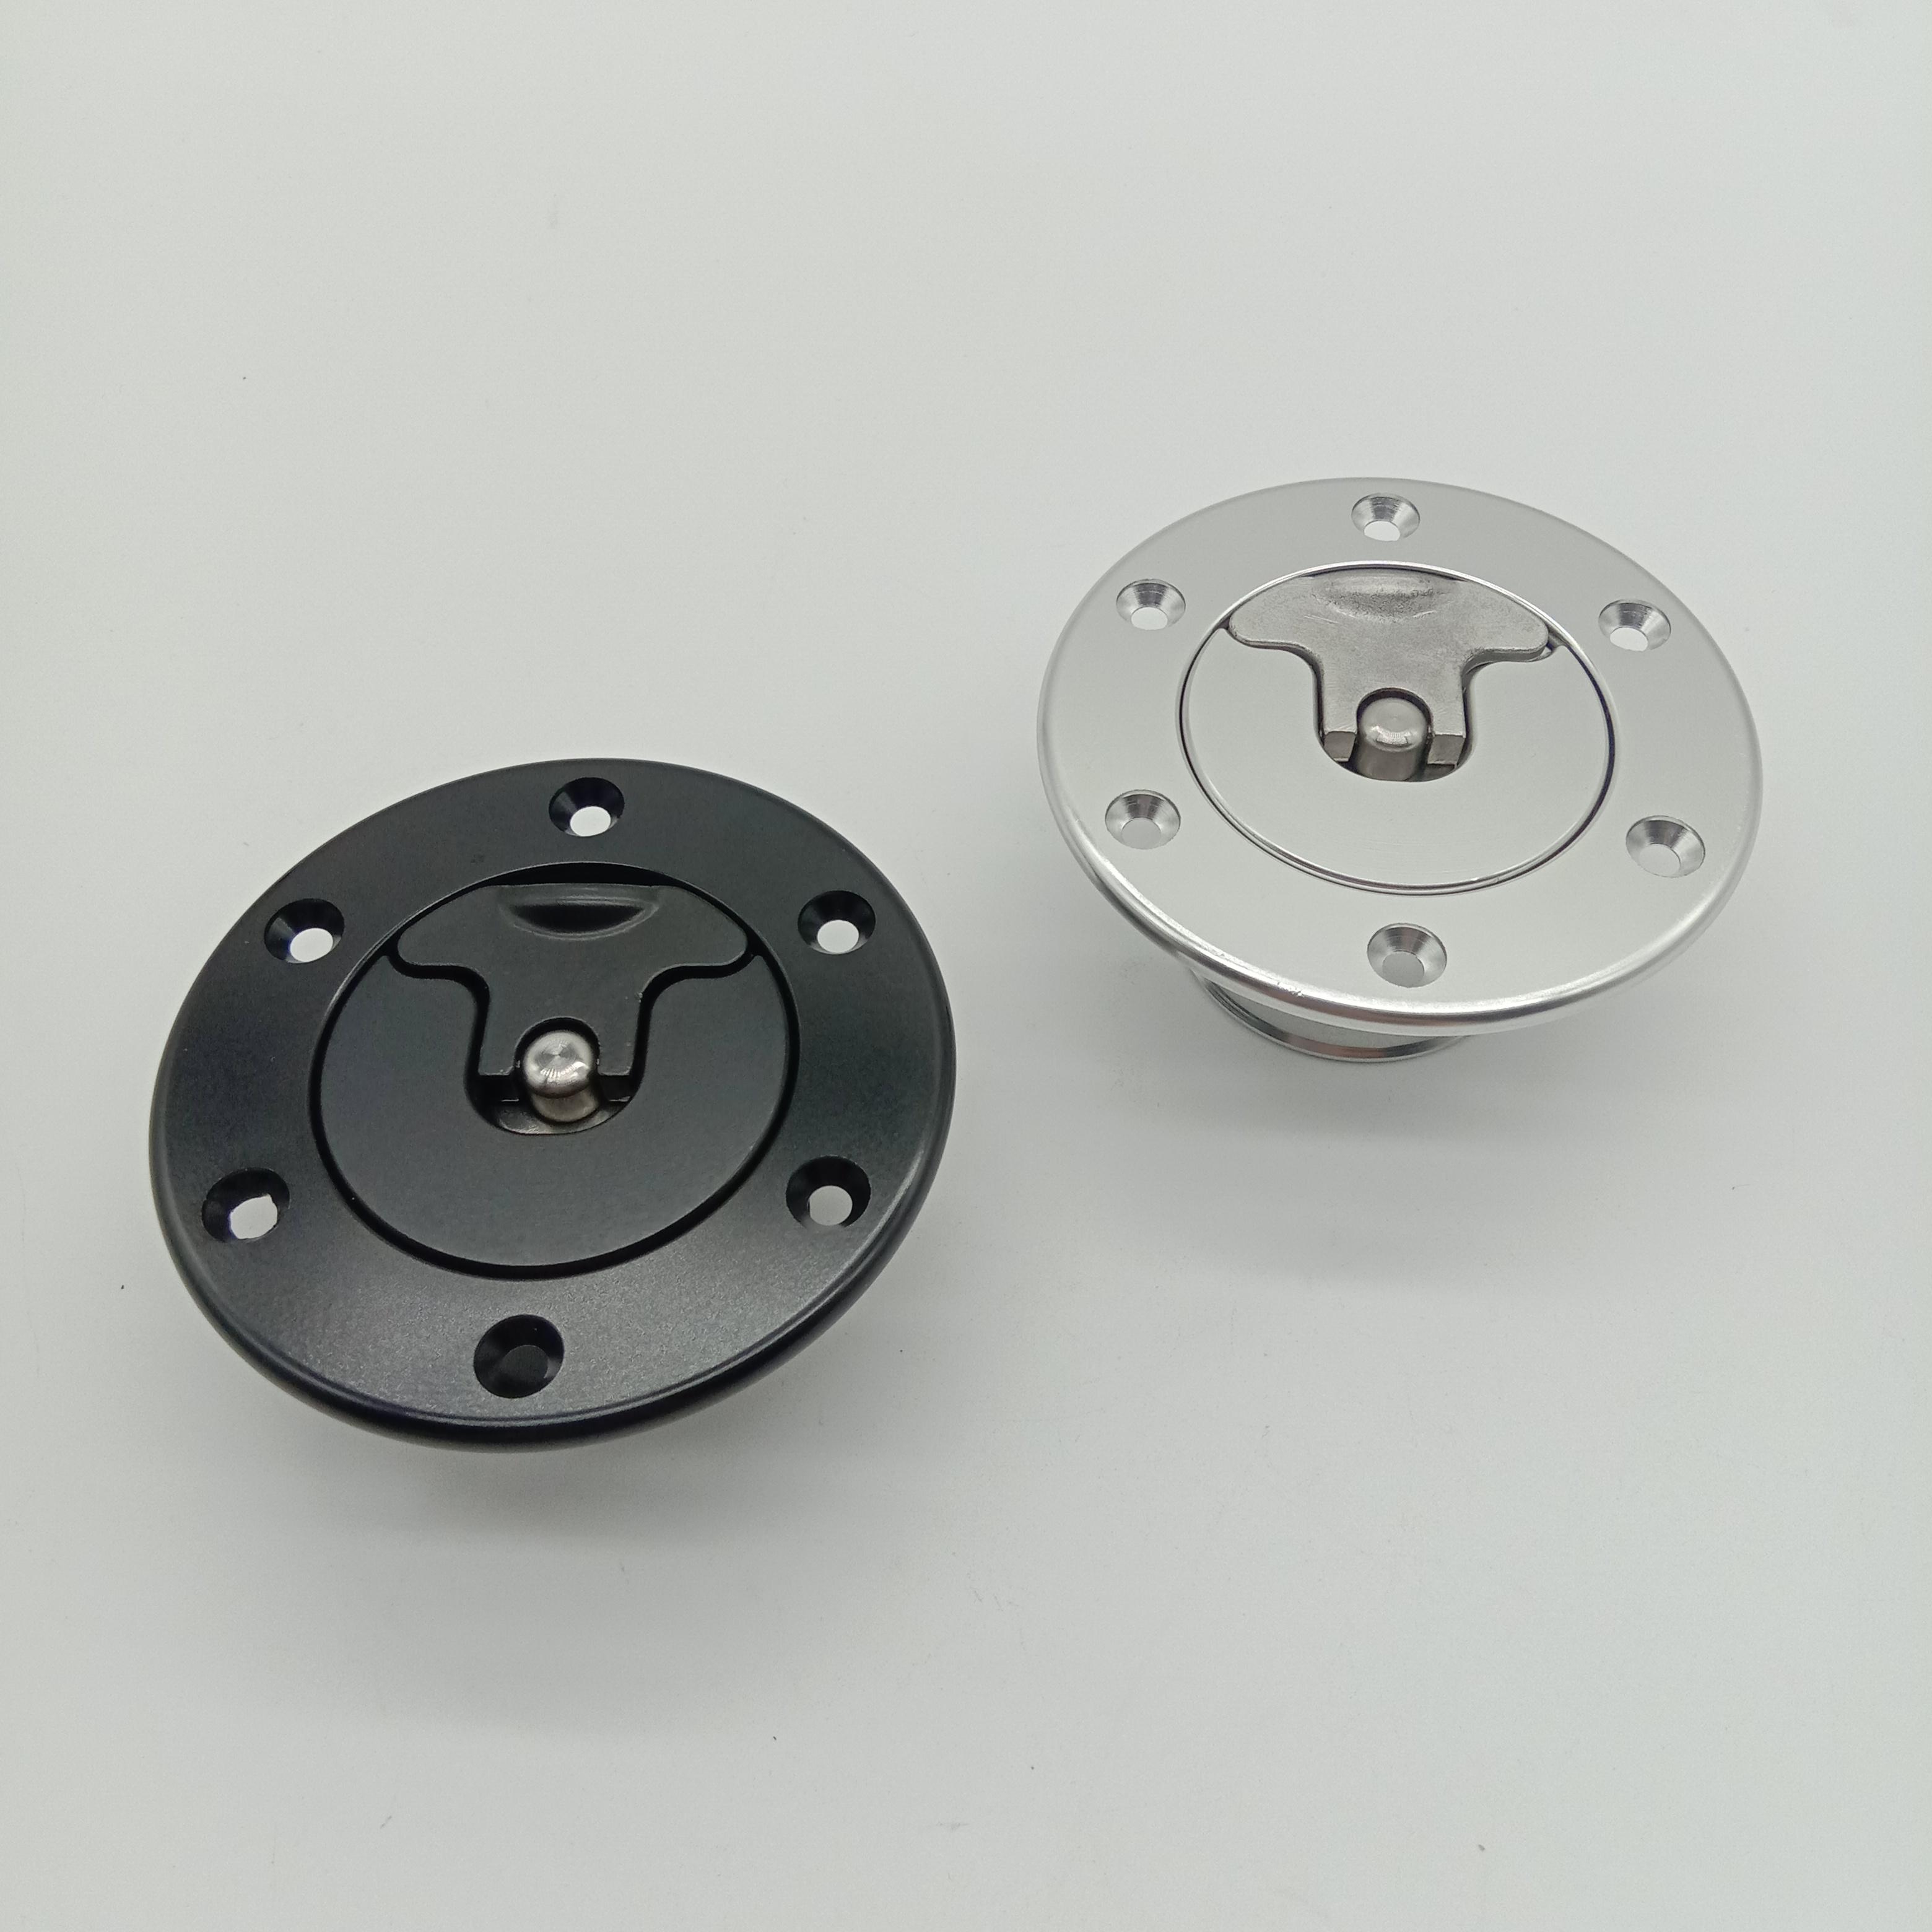 Aluminum Billet cnc machining Fuel cell surge tank cap Mount 6 bolt ID35.5